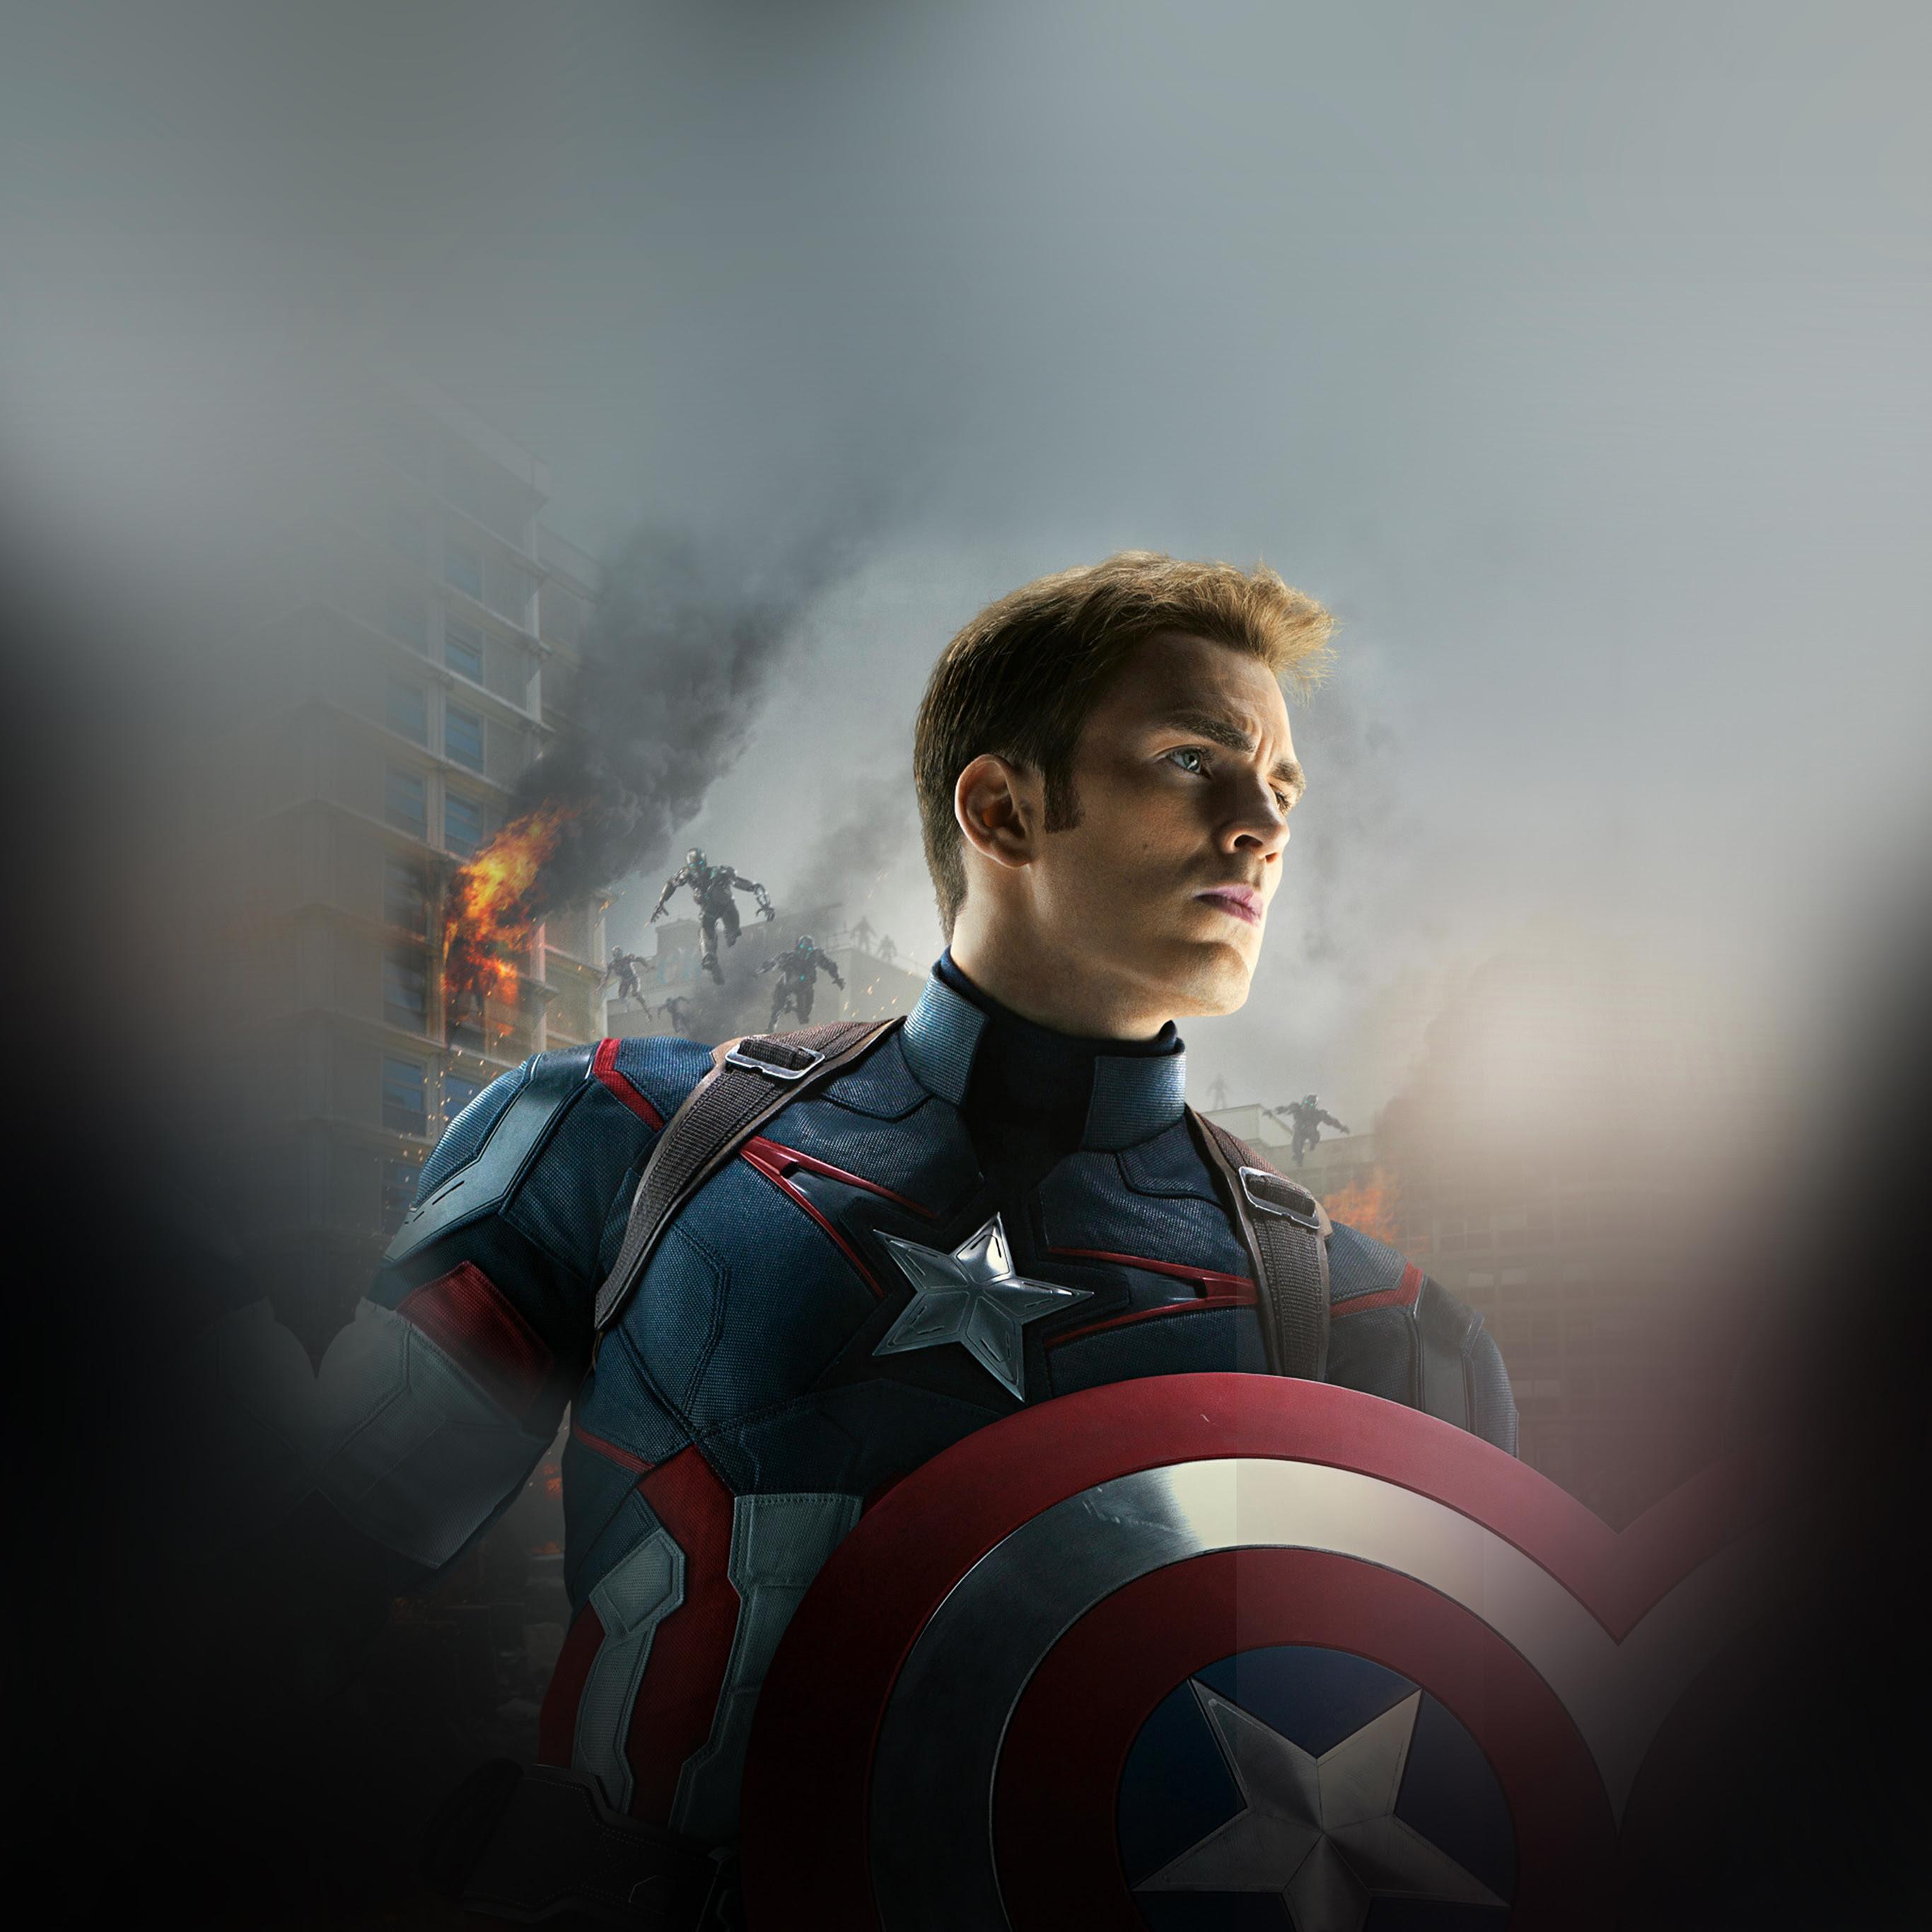 Unduh 100+ Wallpaper Avengers Captain America HD Paling Baru